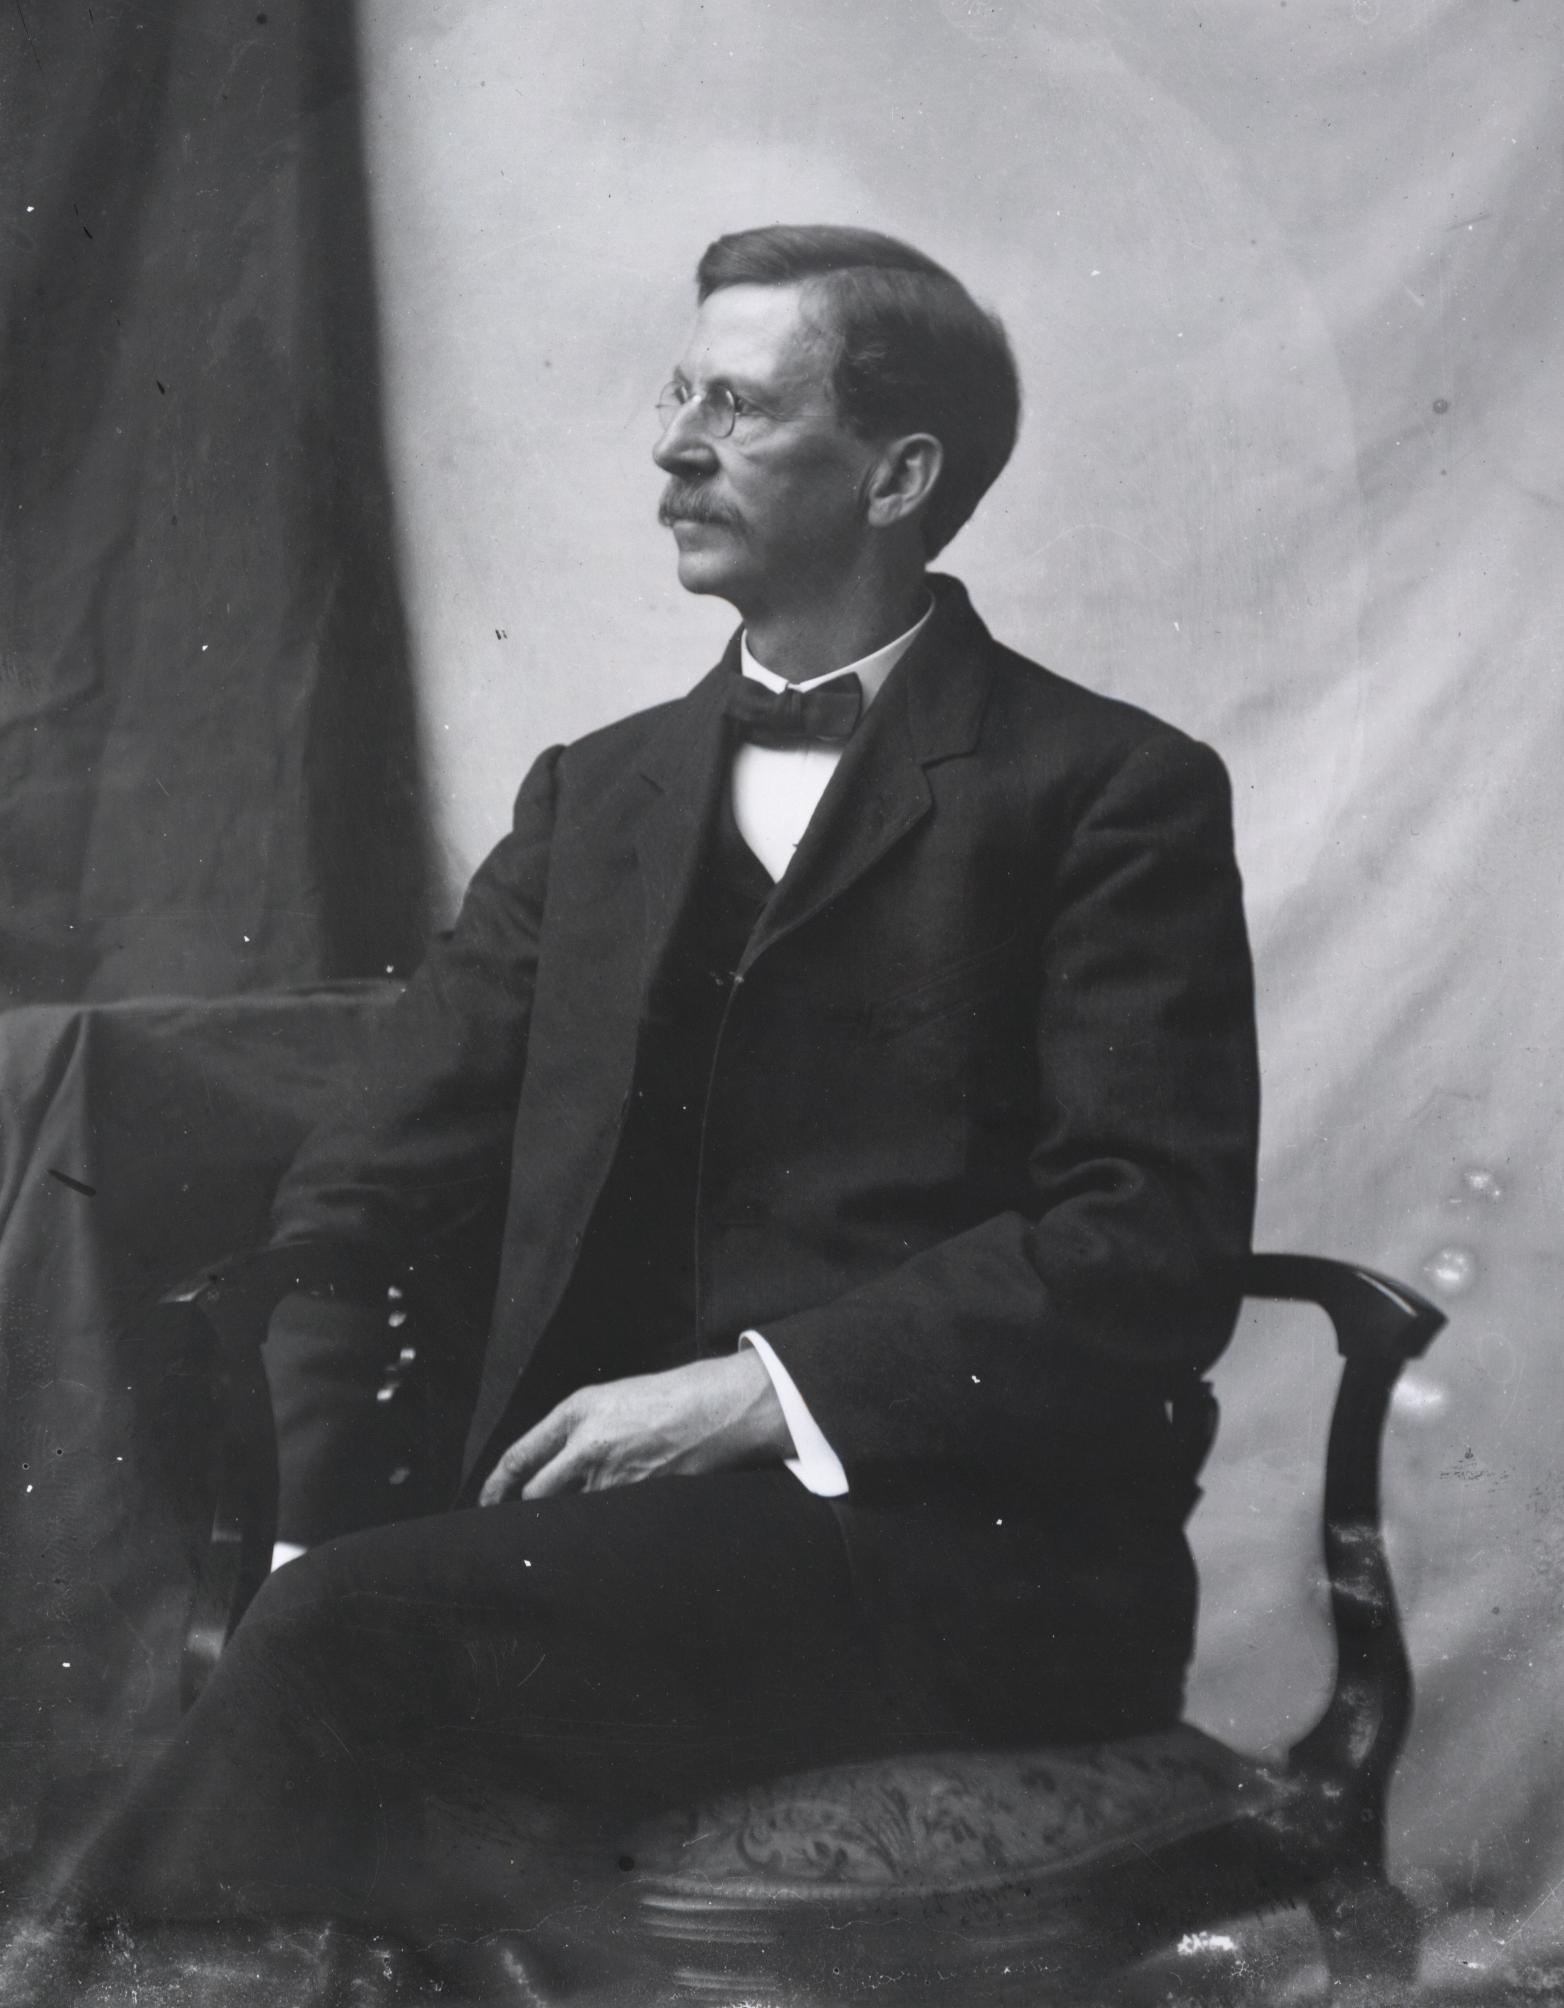 Image of Levin Corbin Handy from Wikidata